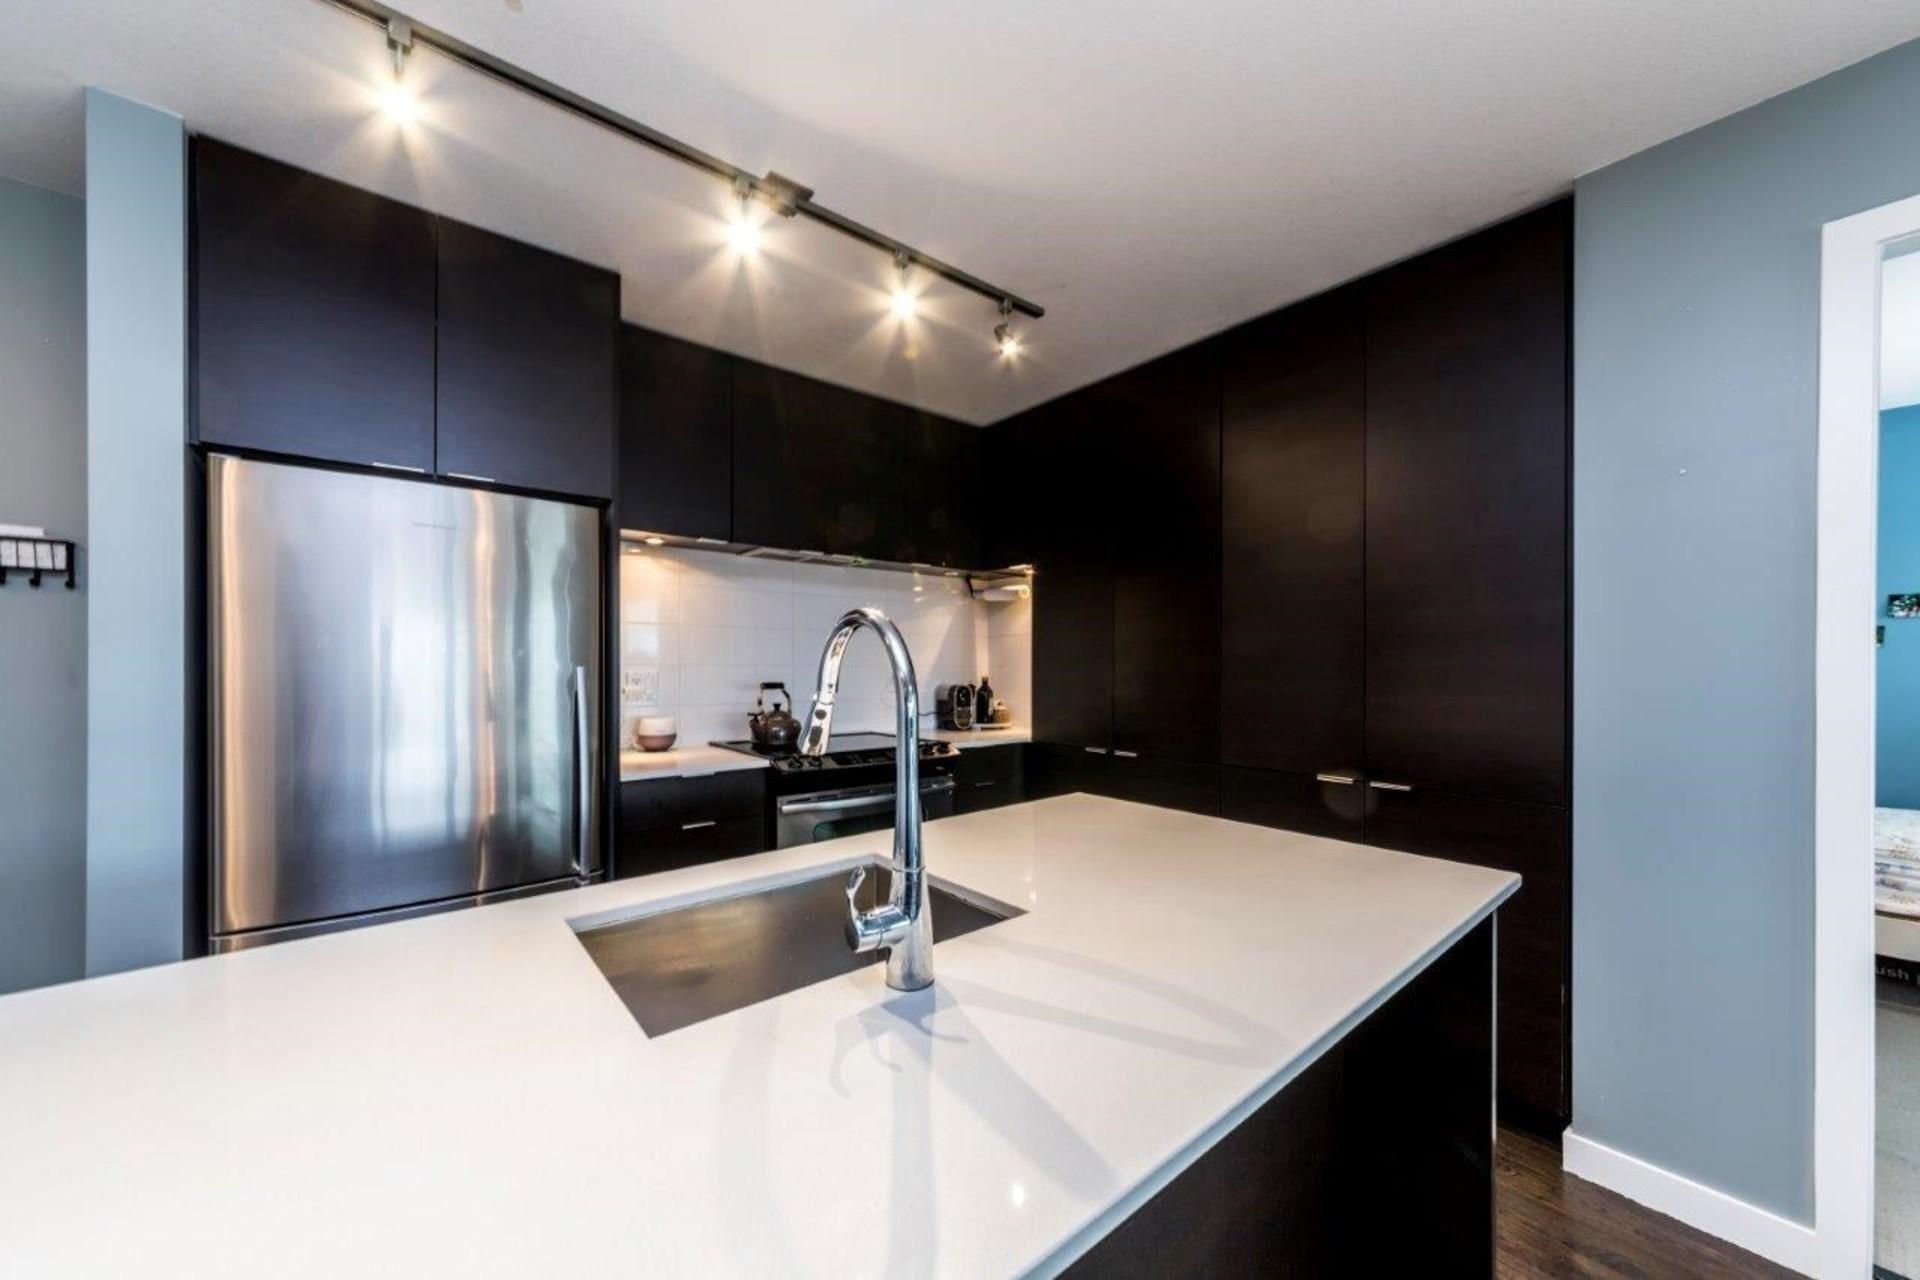 1673-lloyd-avenue-pemberton-nv-north-vancouver-05 at 307 - 1673 Lloyd Avenue, Pemberton NV, North Vancouver